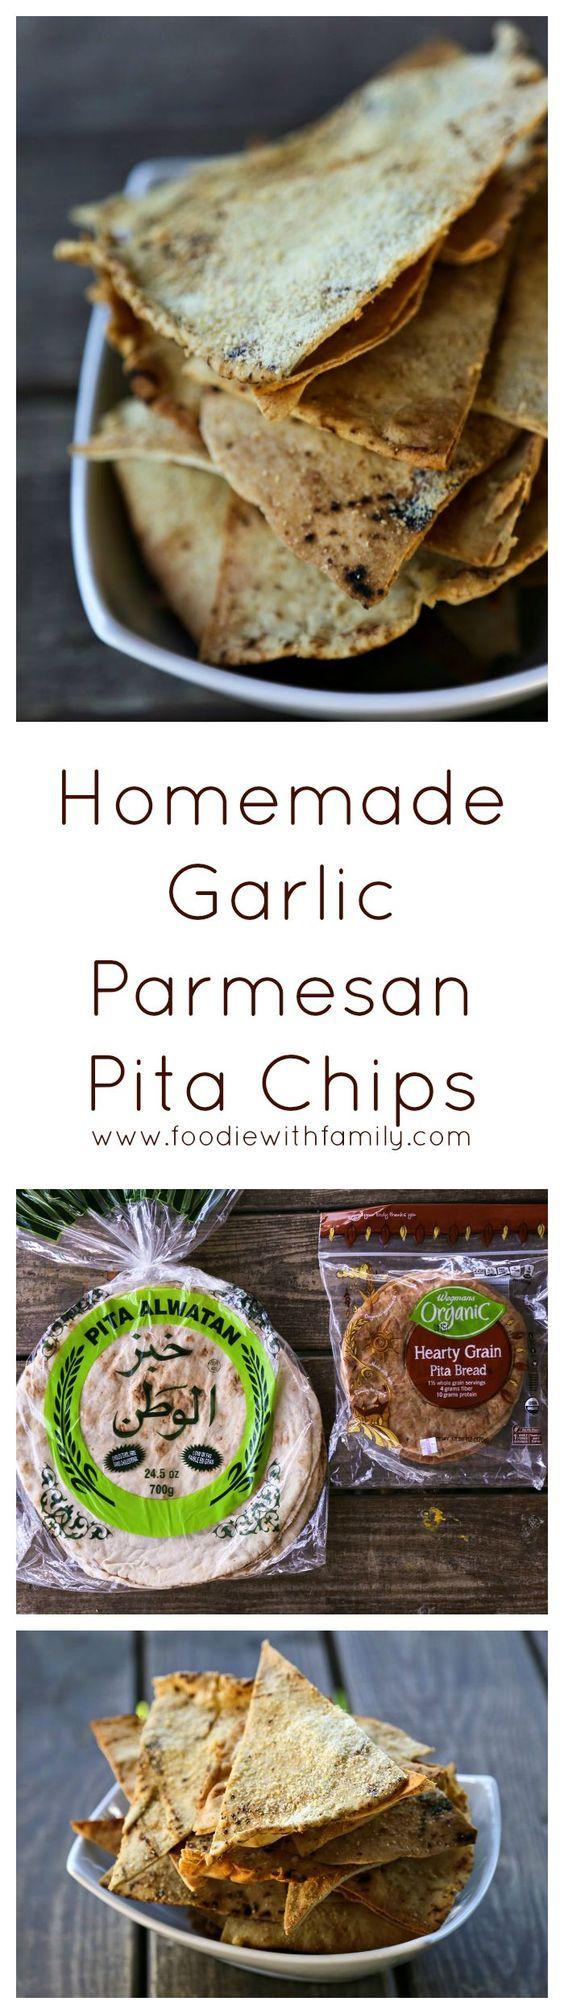 Homemade Garlic Paramesan Pita Chips from foodiewithfamily.com